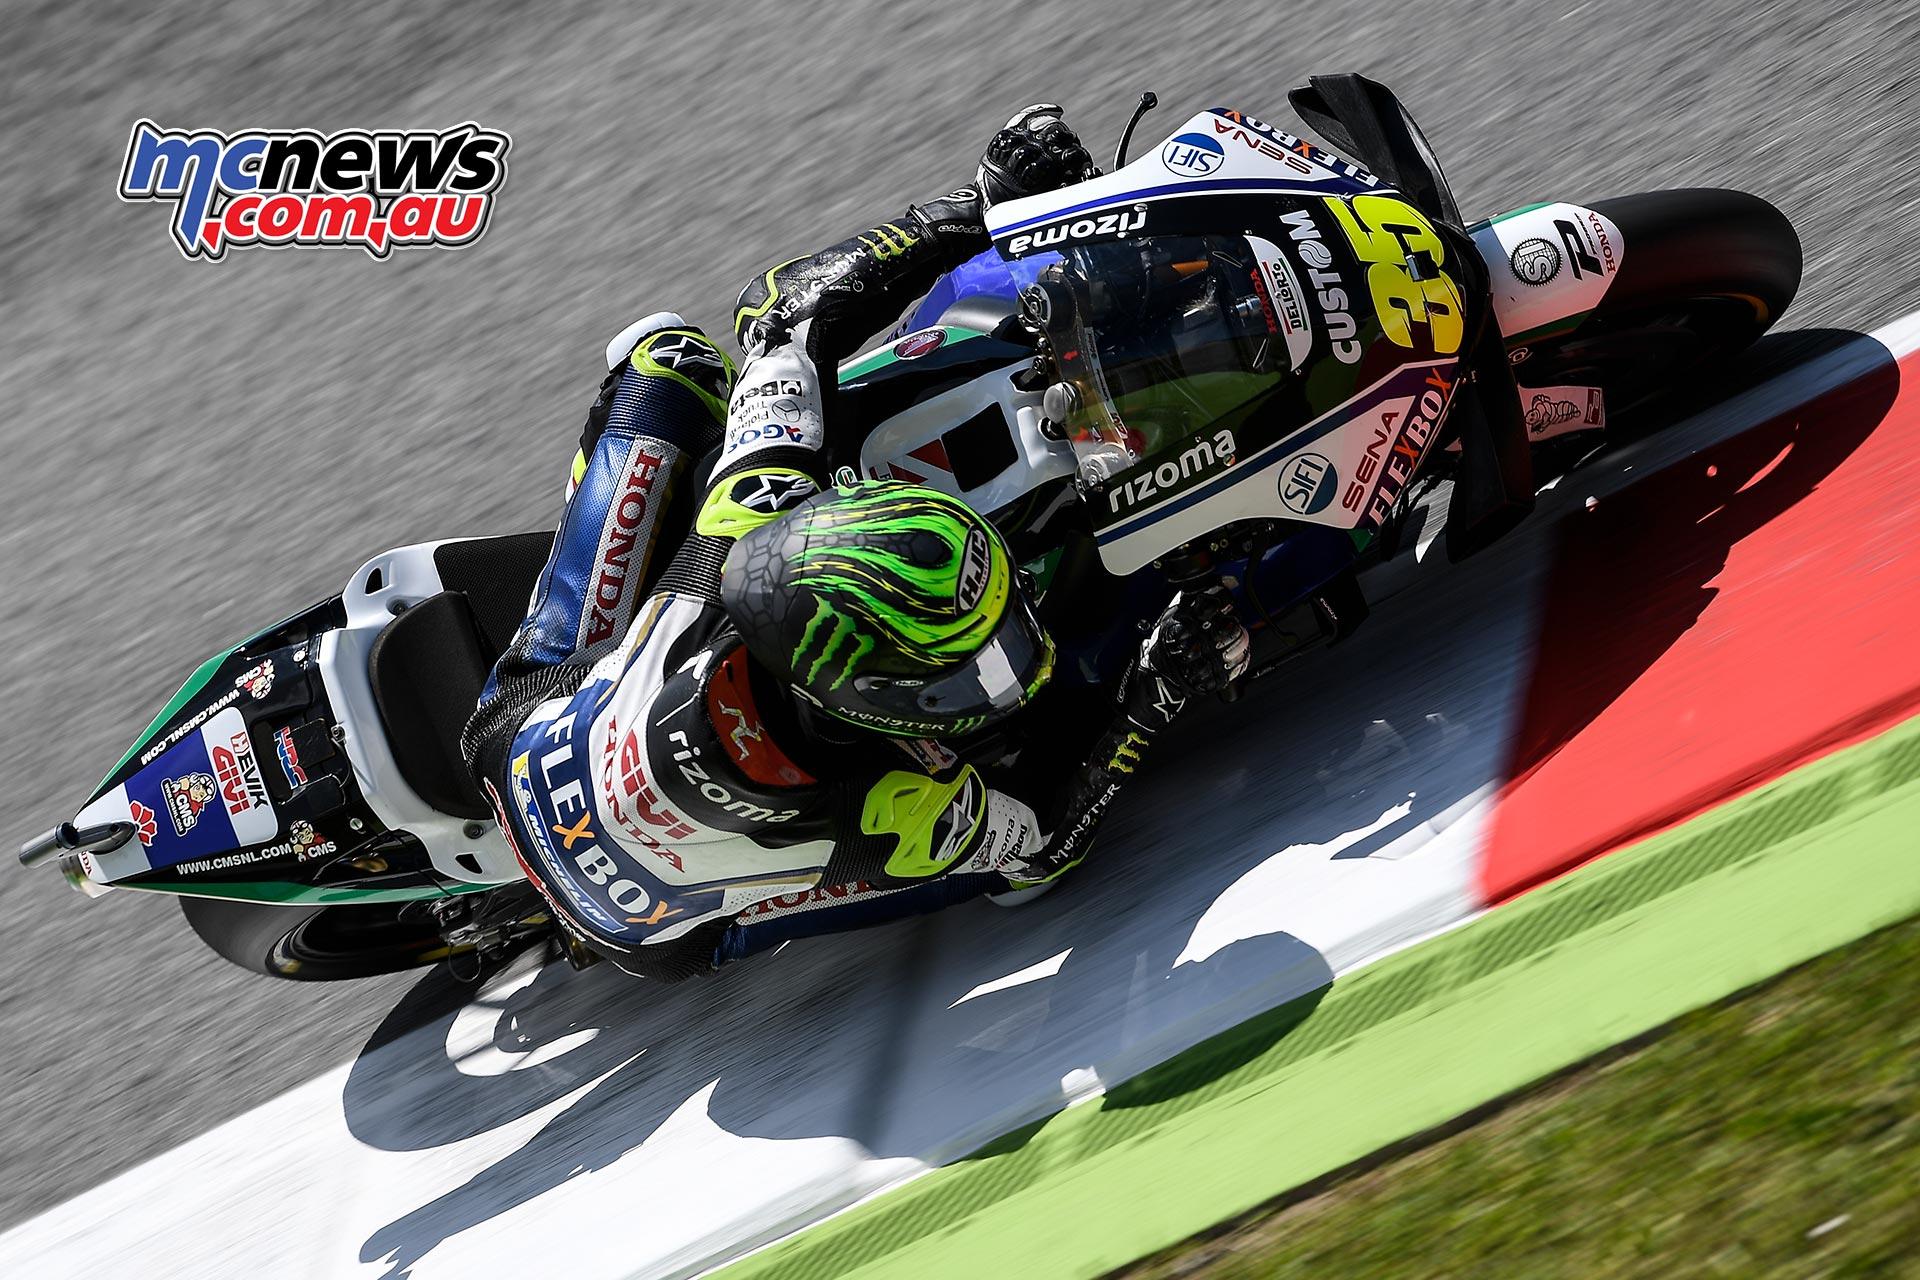 MotoGP Rnd Mugello QP Cal Crutchlow